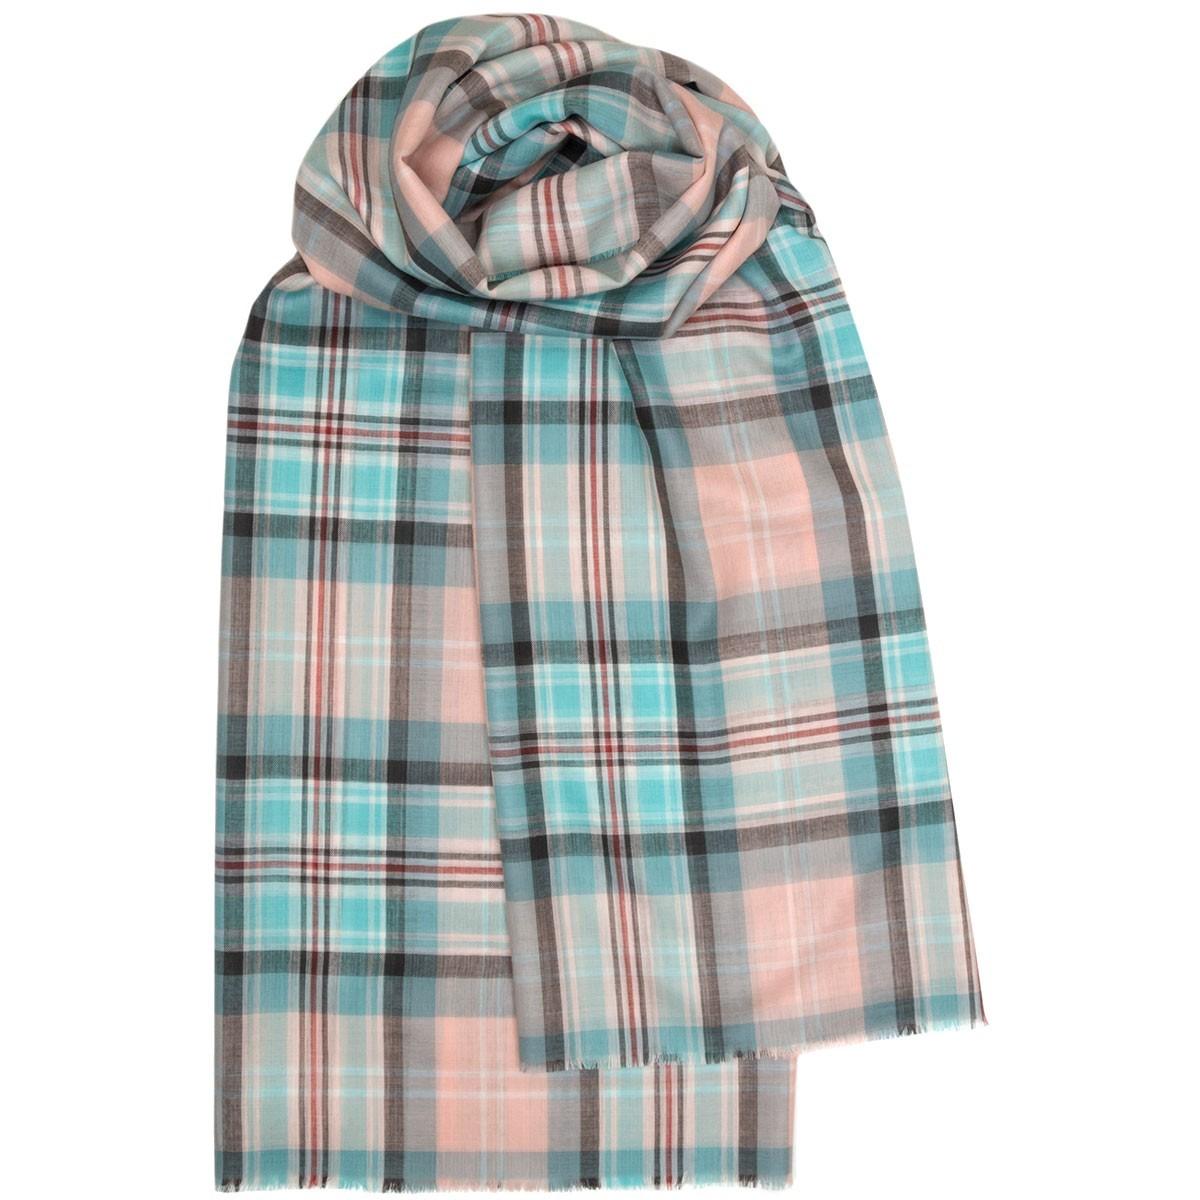 Lochcarron Peter Rabbit Tartan Wool Medium Clasp Purse - Made in Scotland